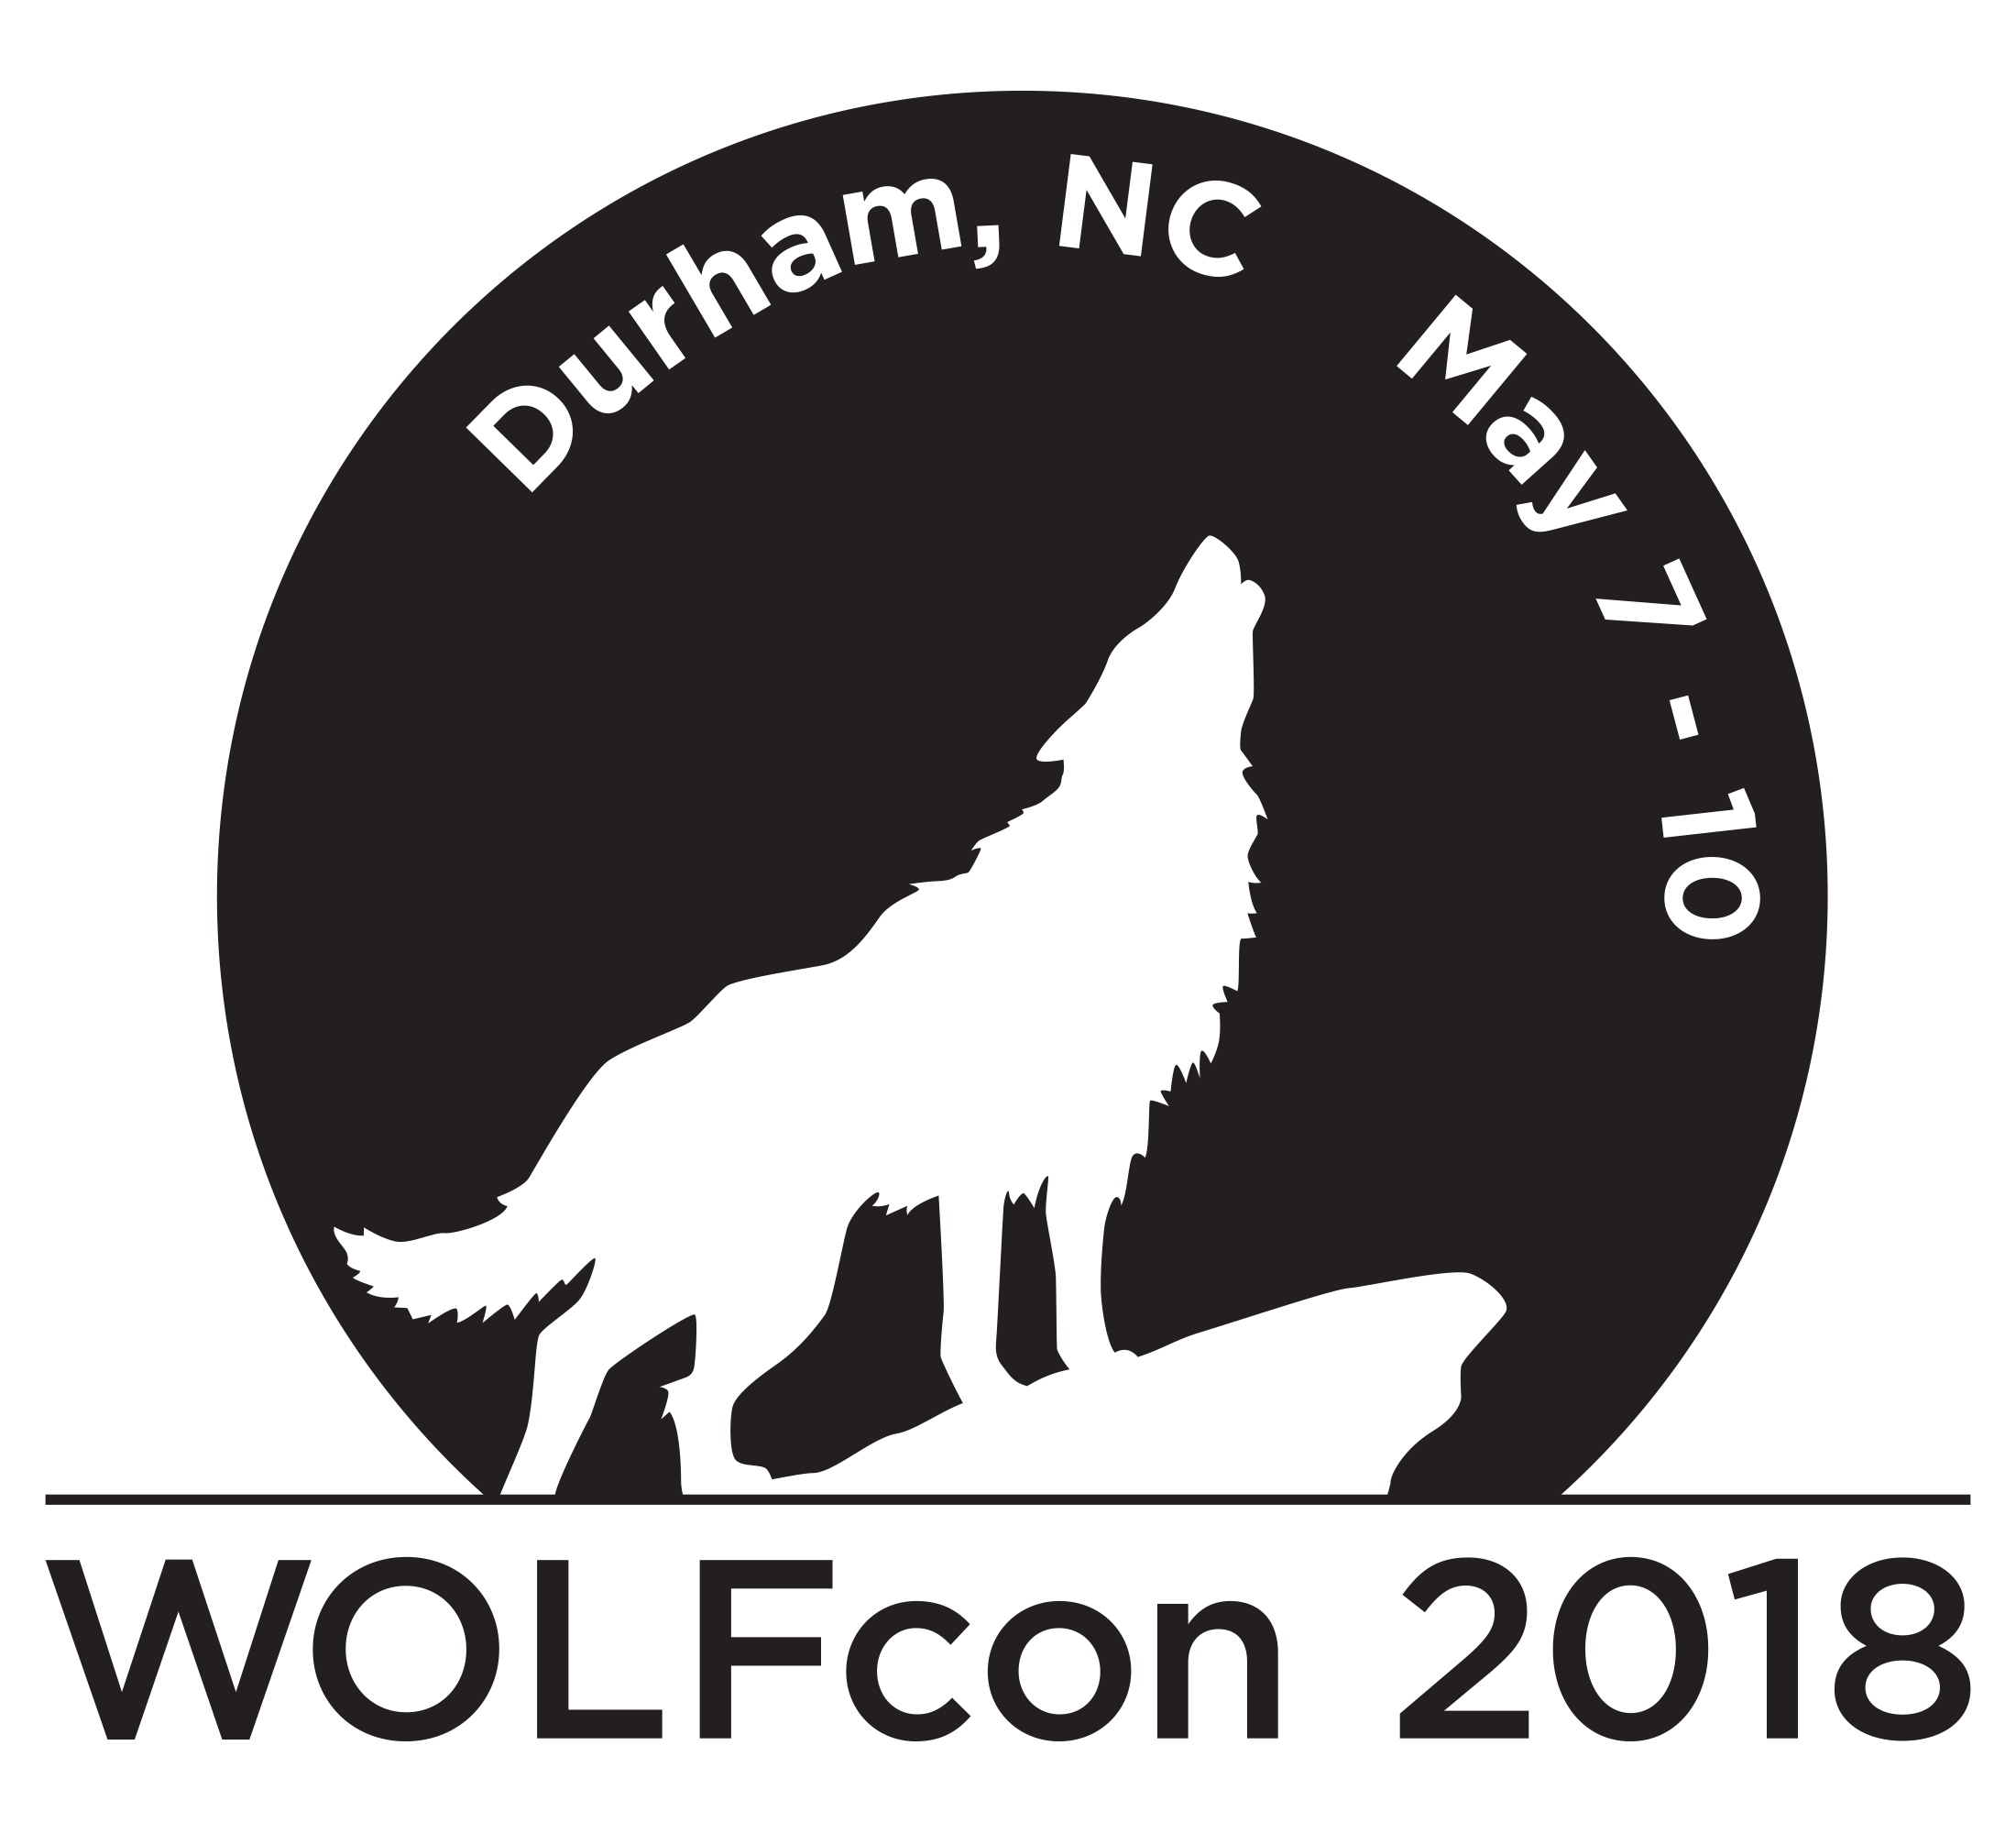 WOLFcon logo